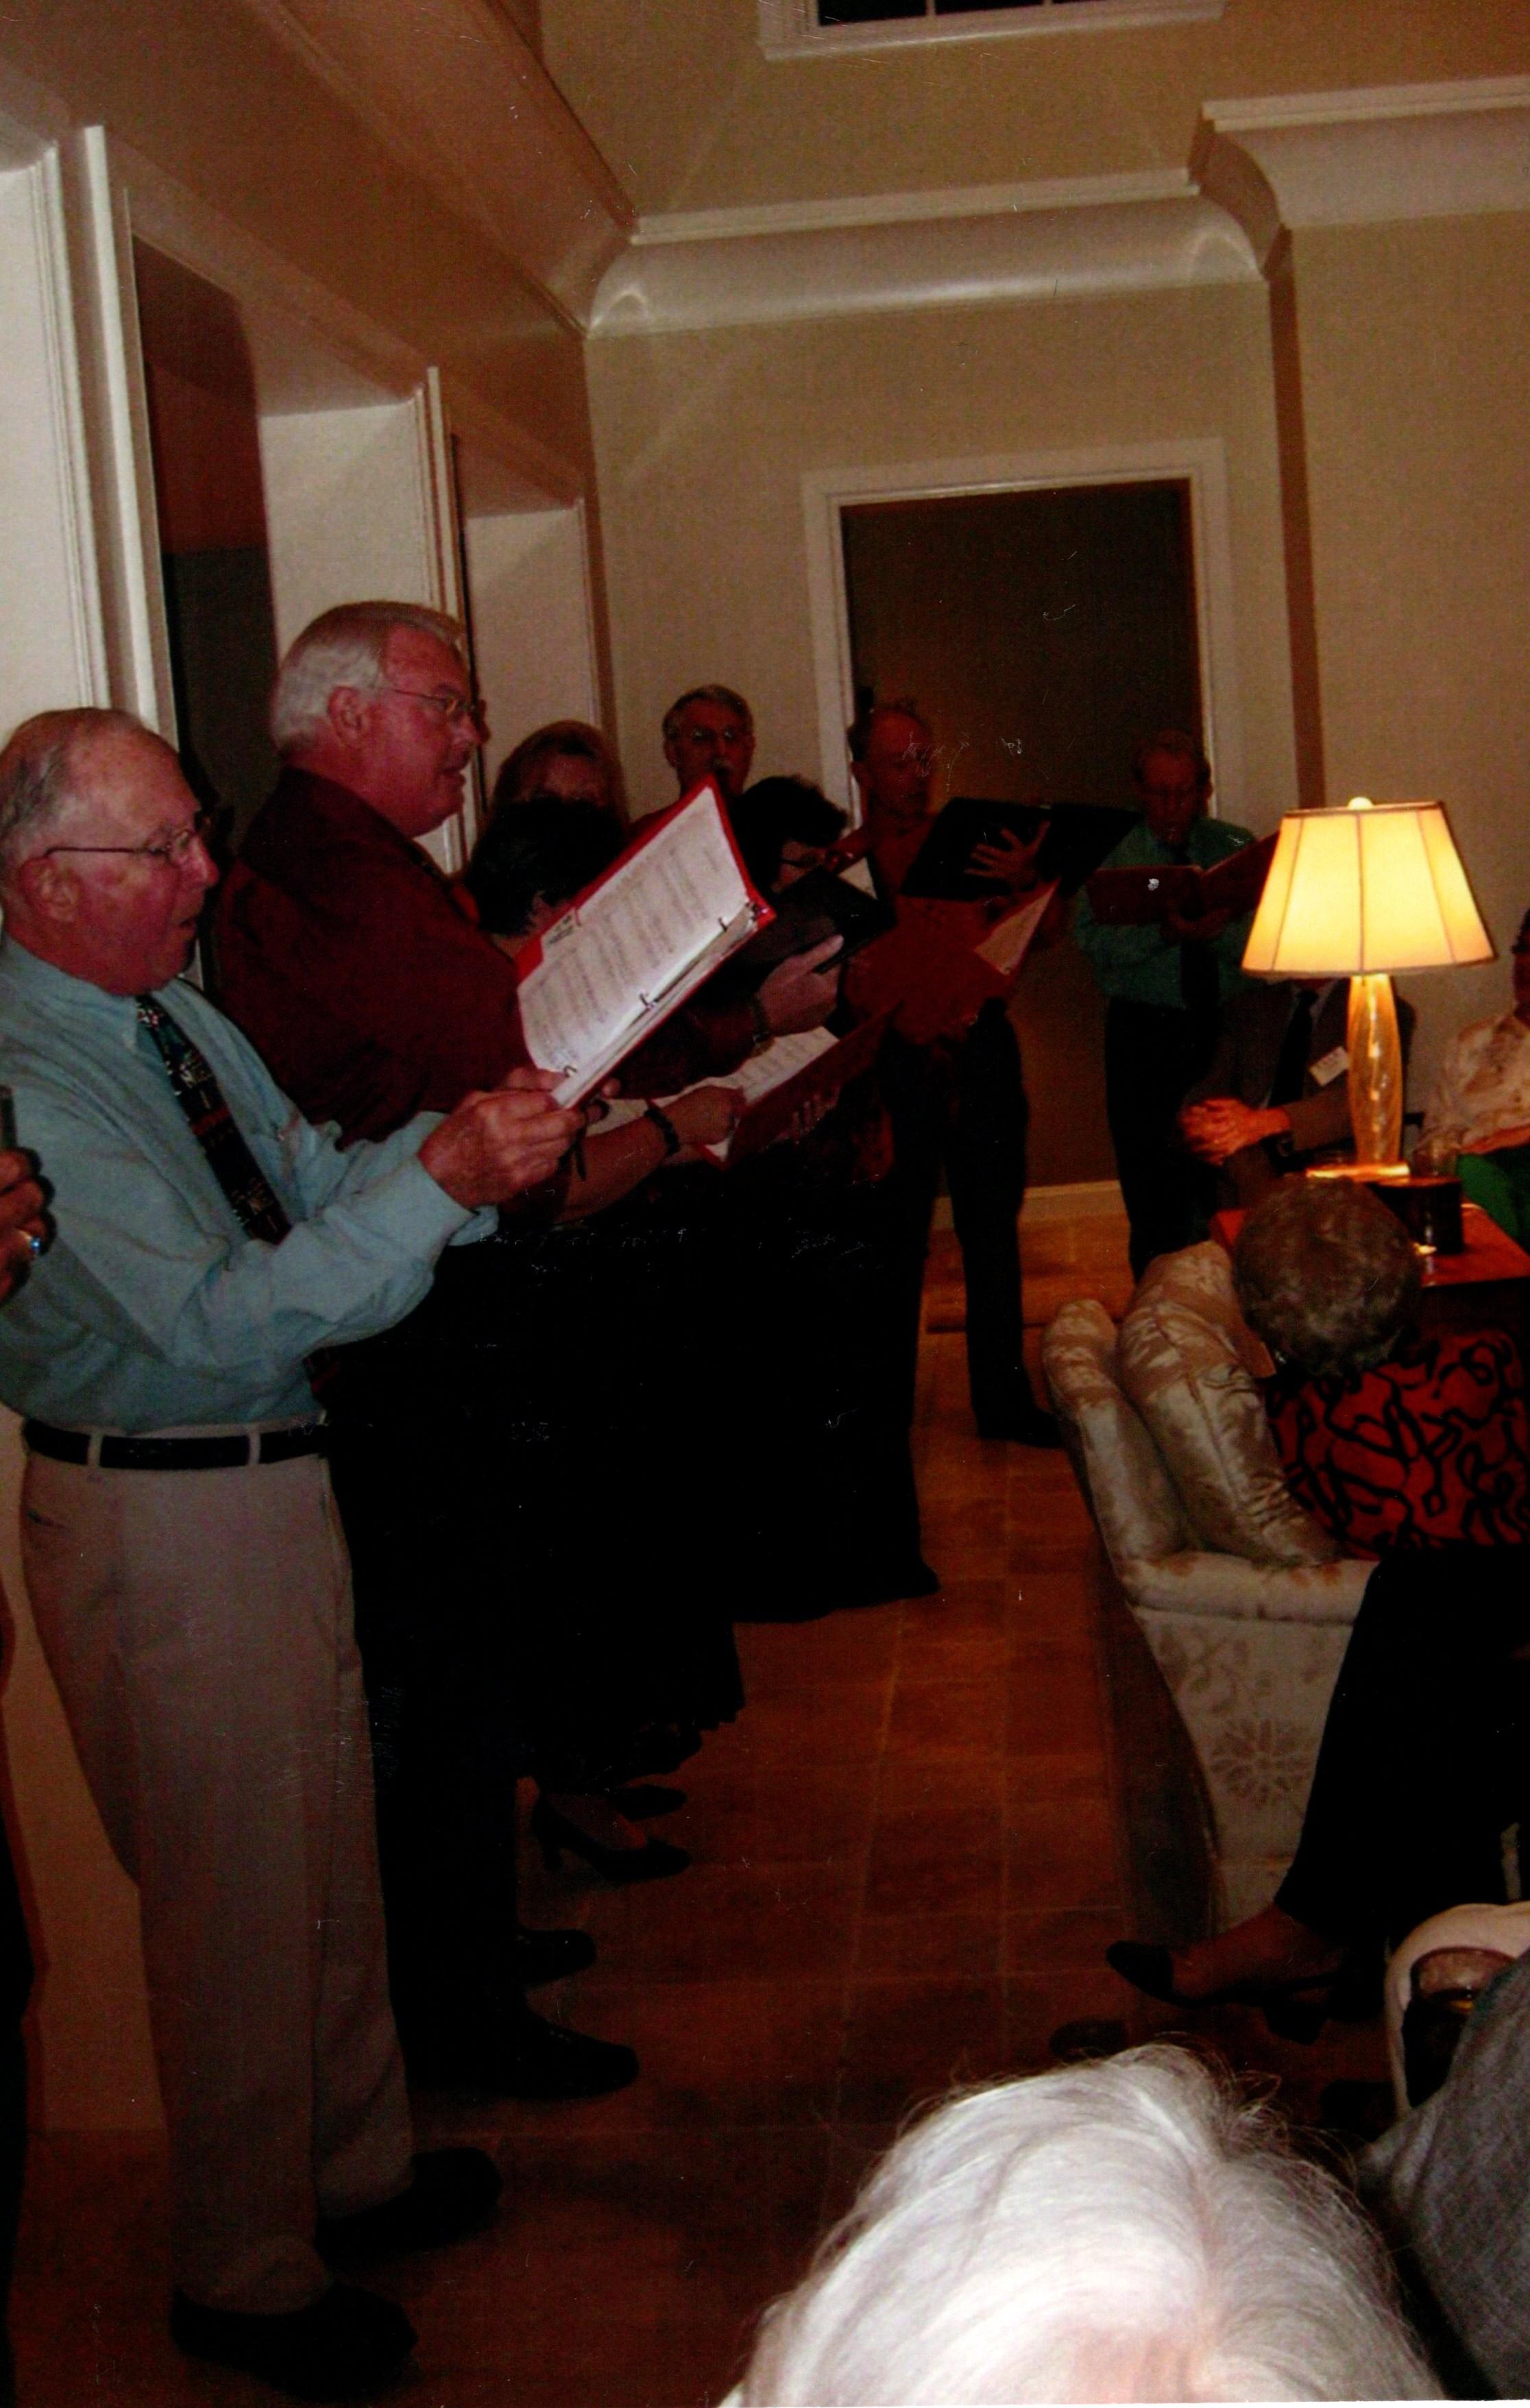 12_11_2008 - HOLIDAY PARTY - TOM WHEELER'S HOME 38.jpg